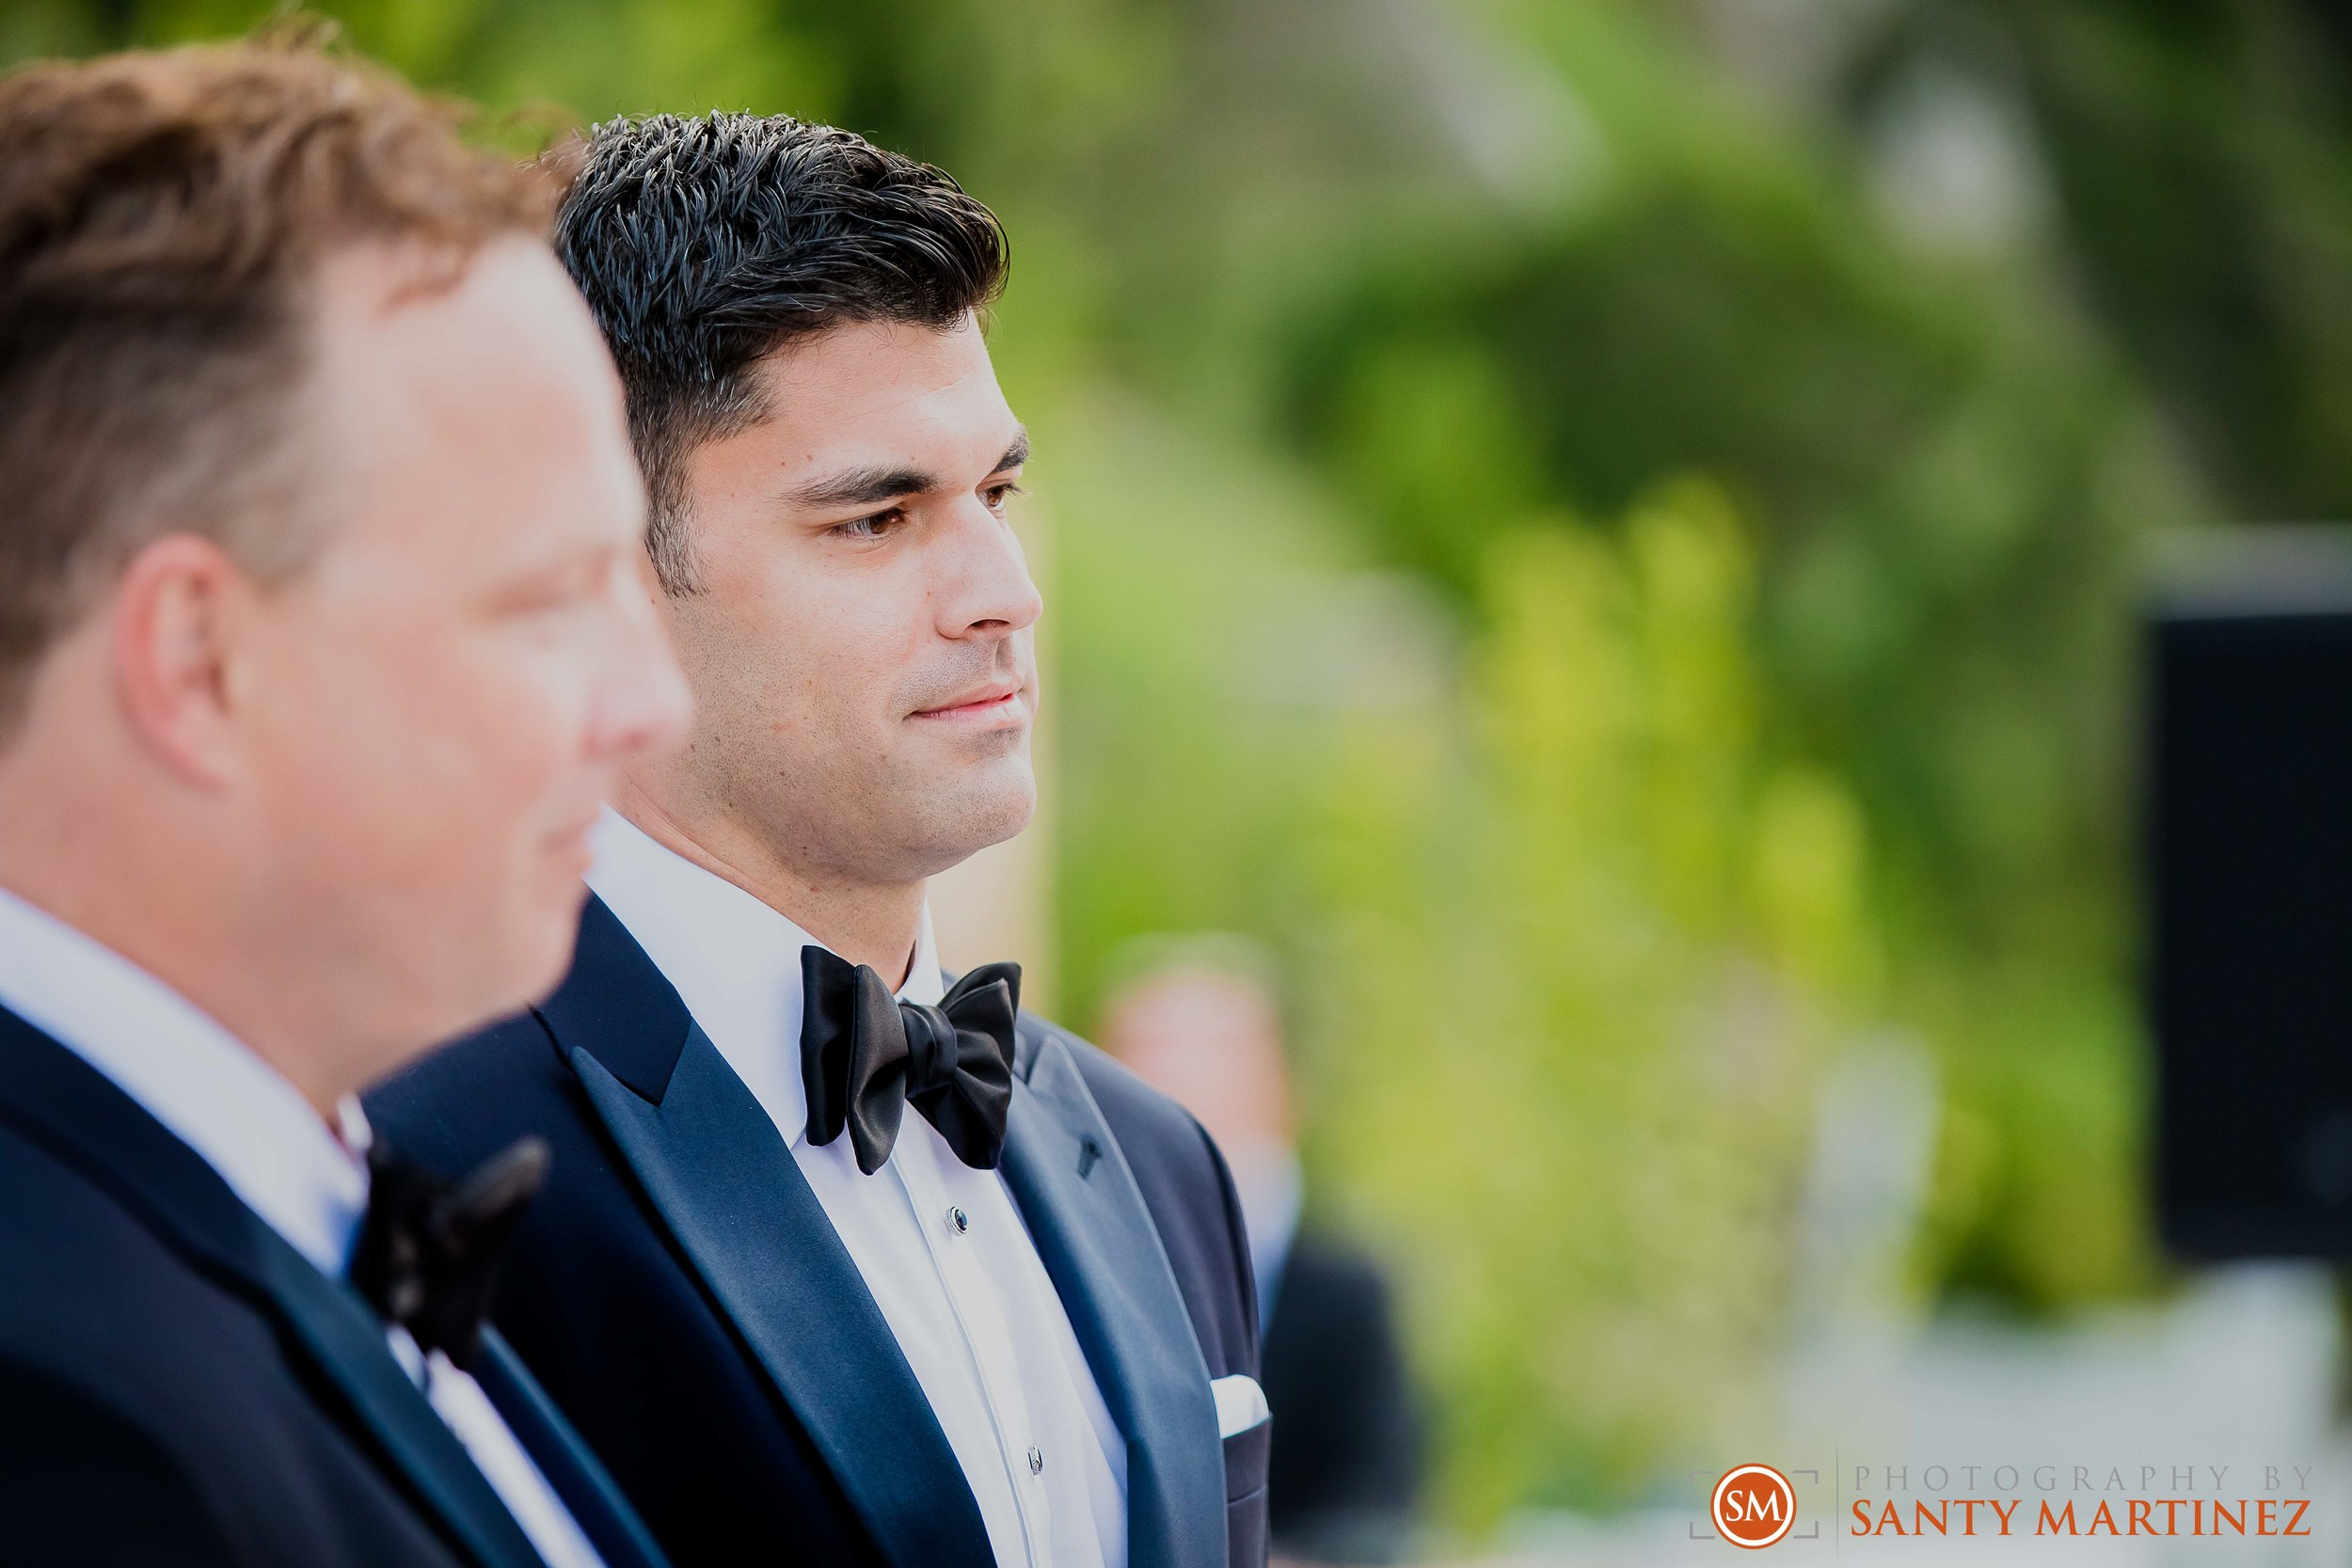 Wedding Capri Italy - Photography by Santy Martinez-50.jpg